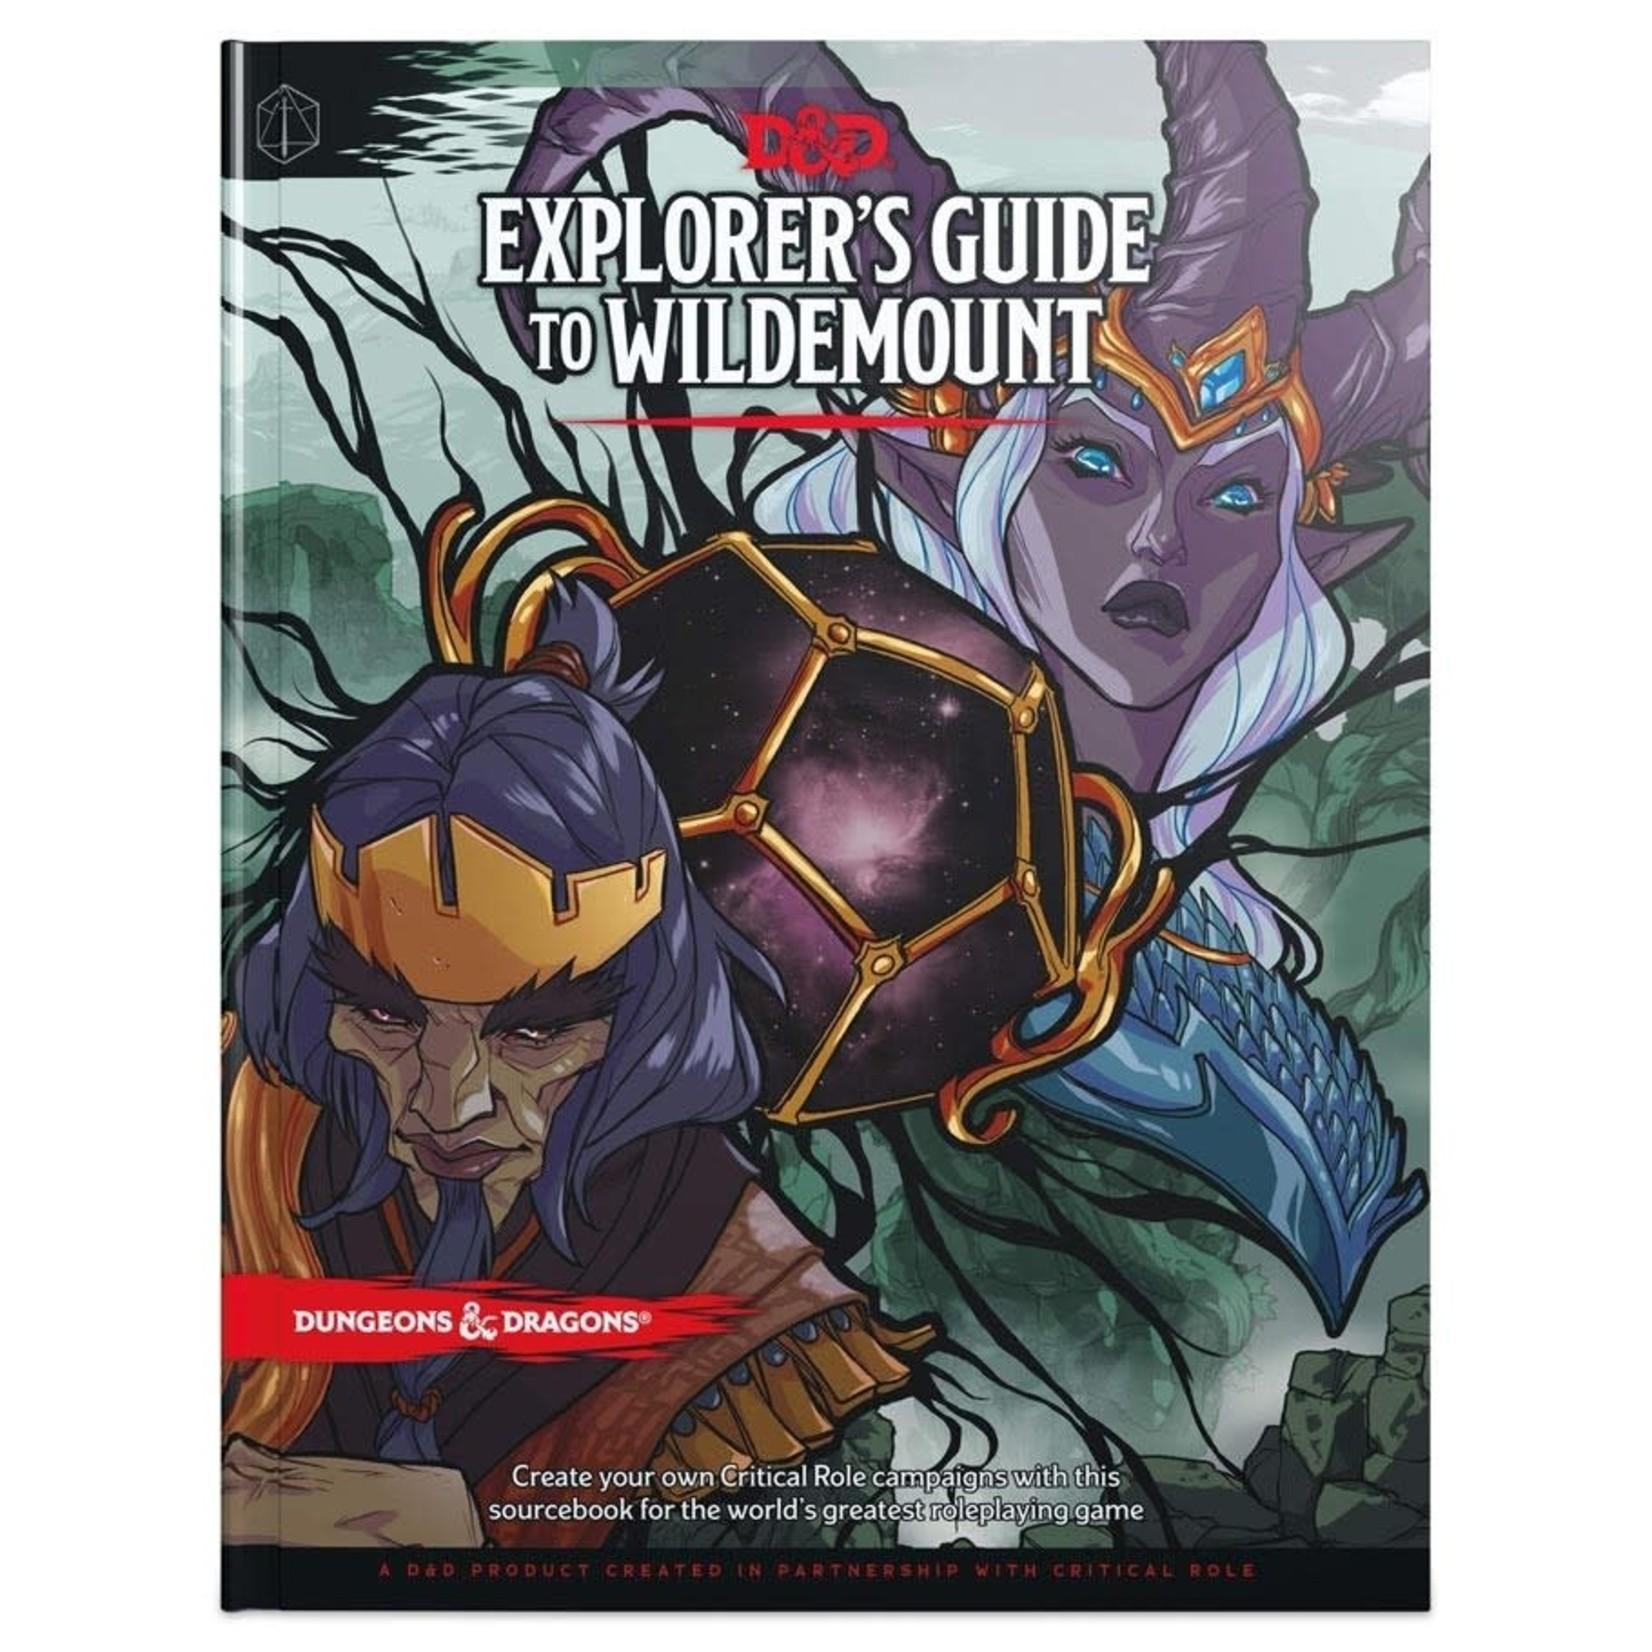 Dungeons & Dragons D&D 5e Explorer's Guide to Wildemount